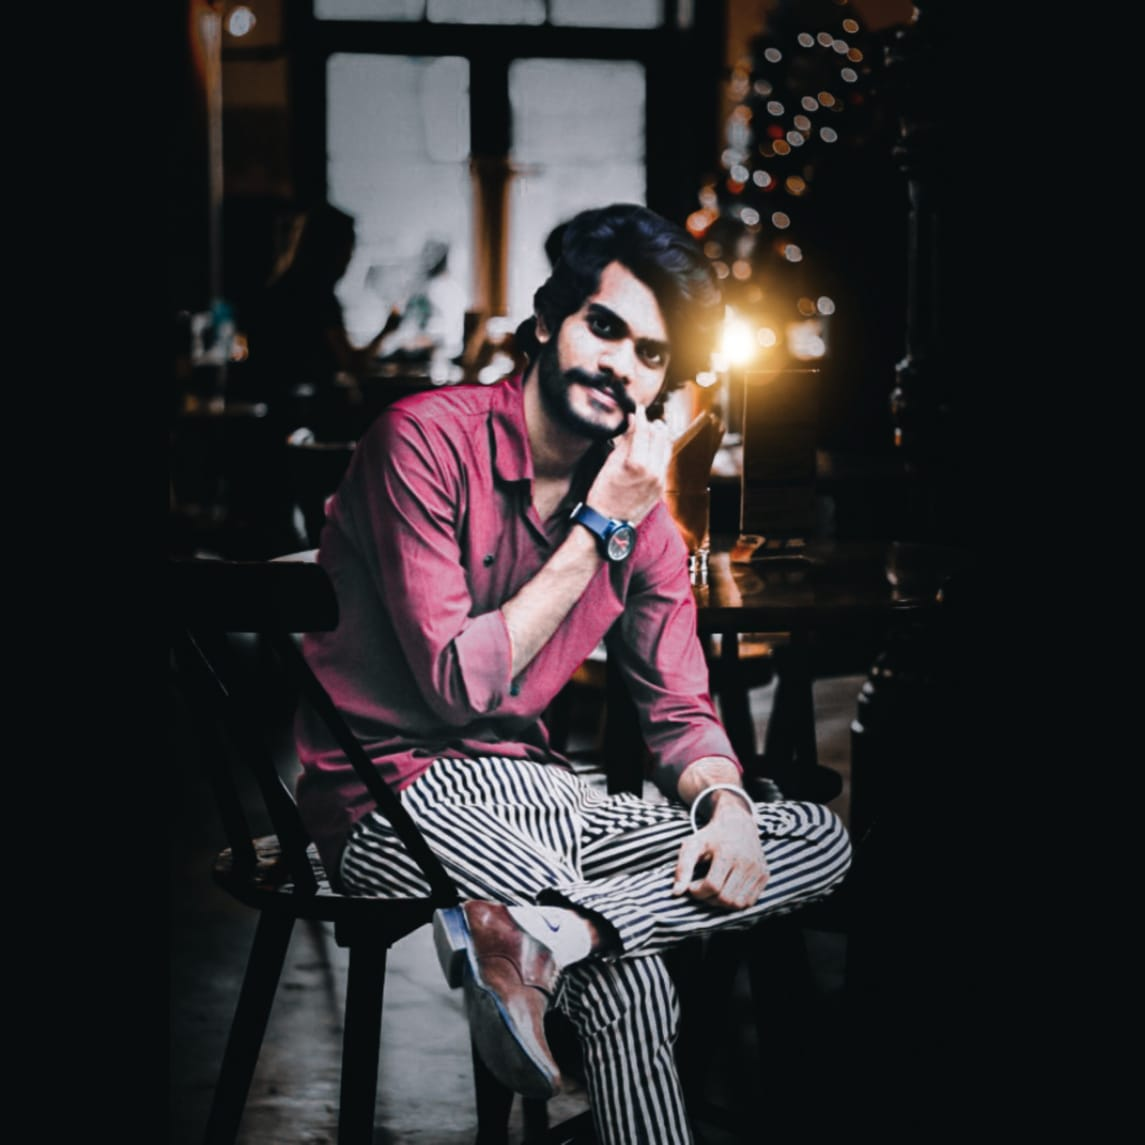 Mayank Singh Rajput is working towards providing platforms to hardworking artists